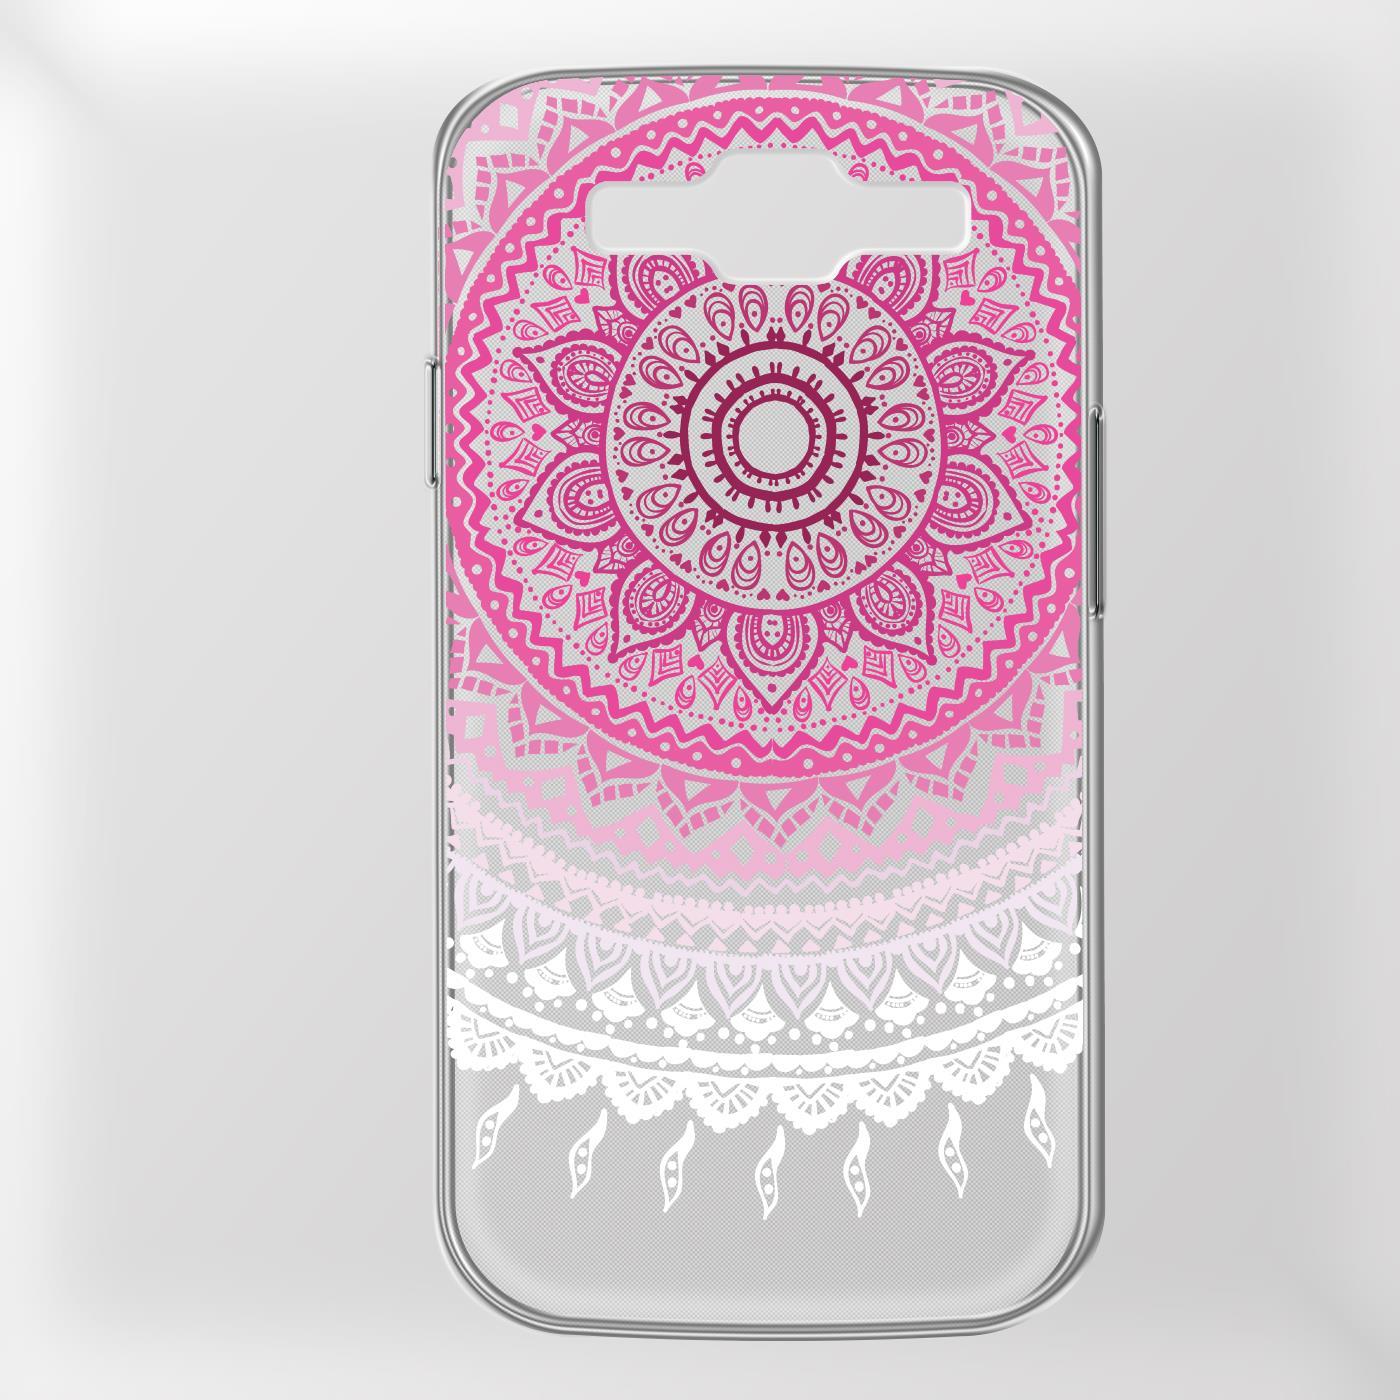 Samsung-Galaxy-S3-Neo-Handy-Schutz-Huelle-Case-TPU-Silikon-Cover-Tasche-Mandala Indexbild 22